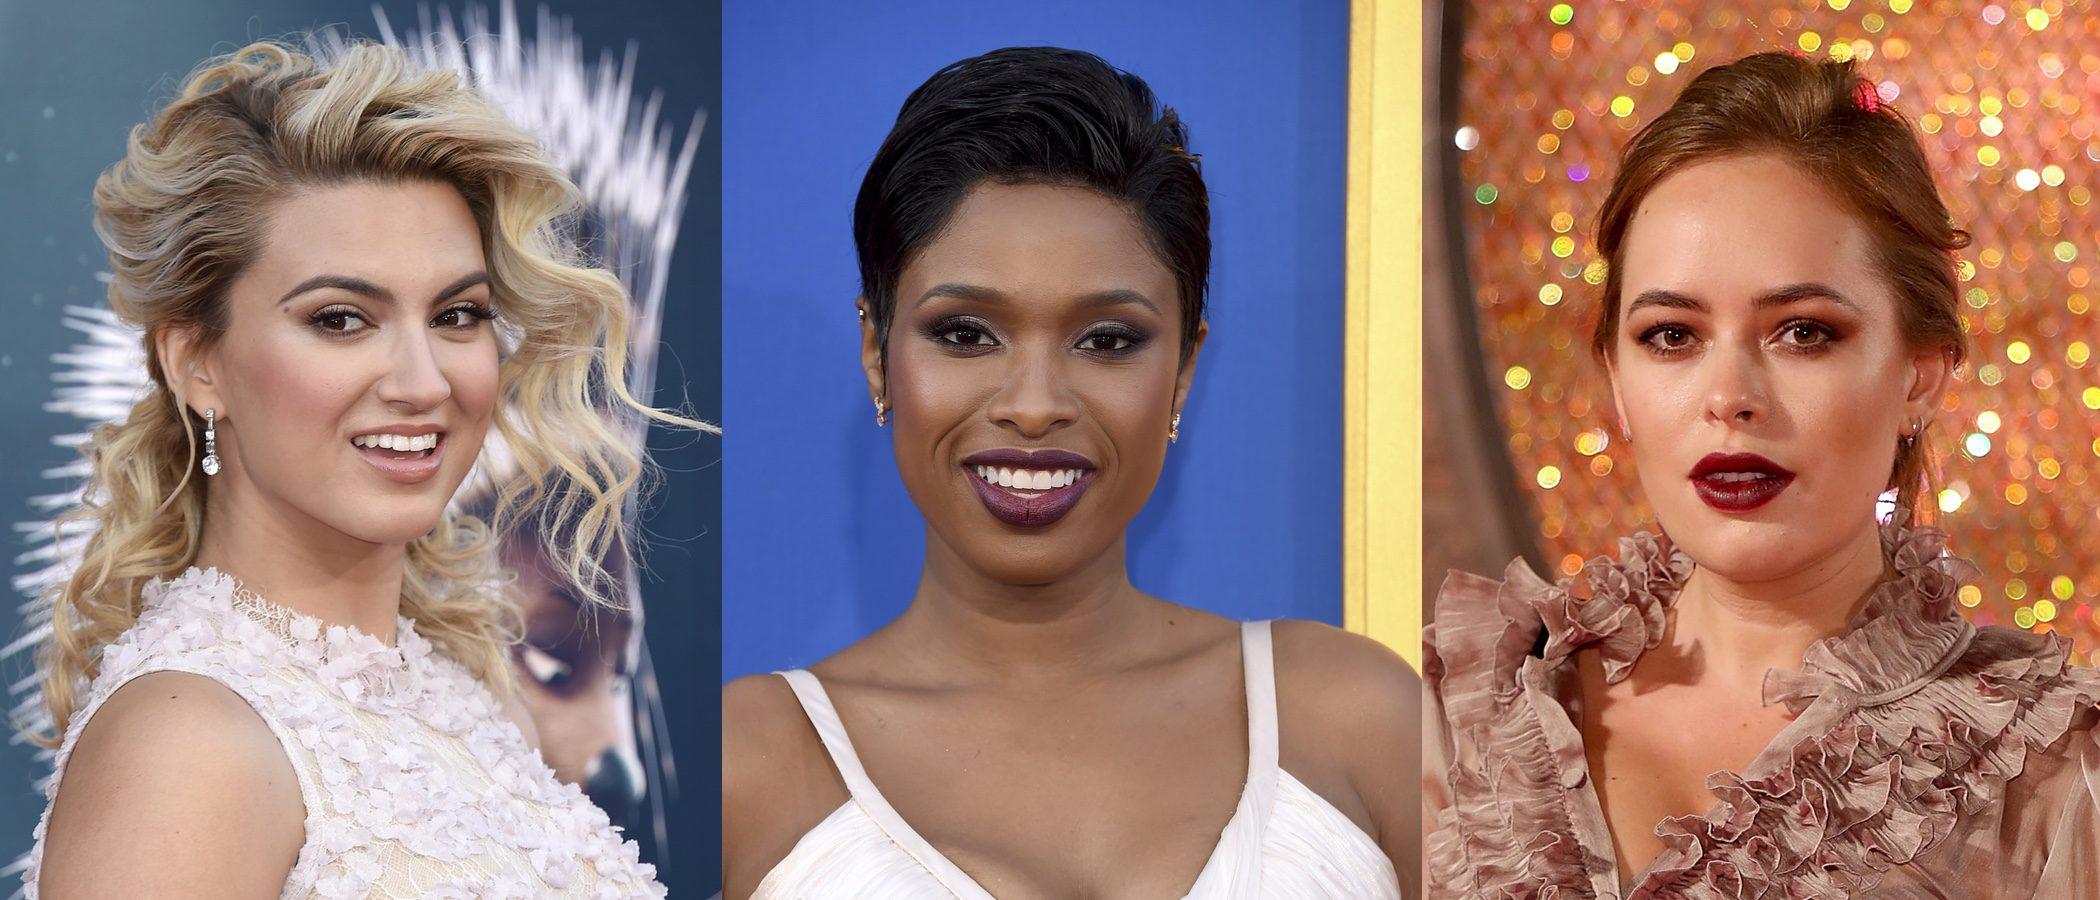 Tori Kelly, Jennifer Hudson y Tanya Burr entre los mejores beauty looks de la semana